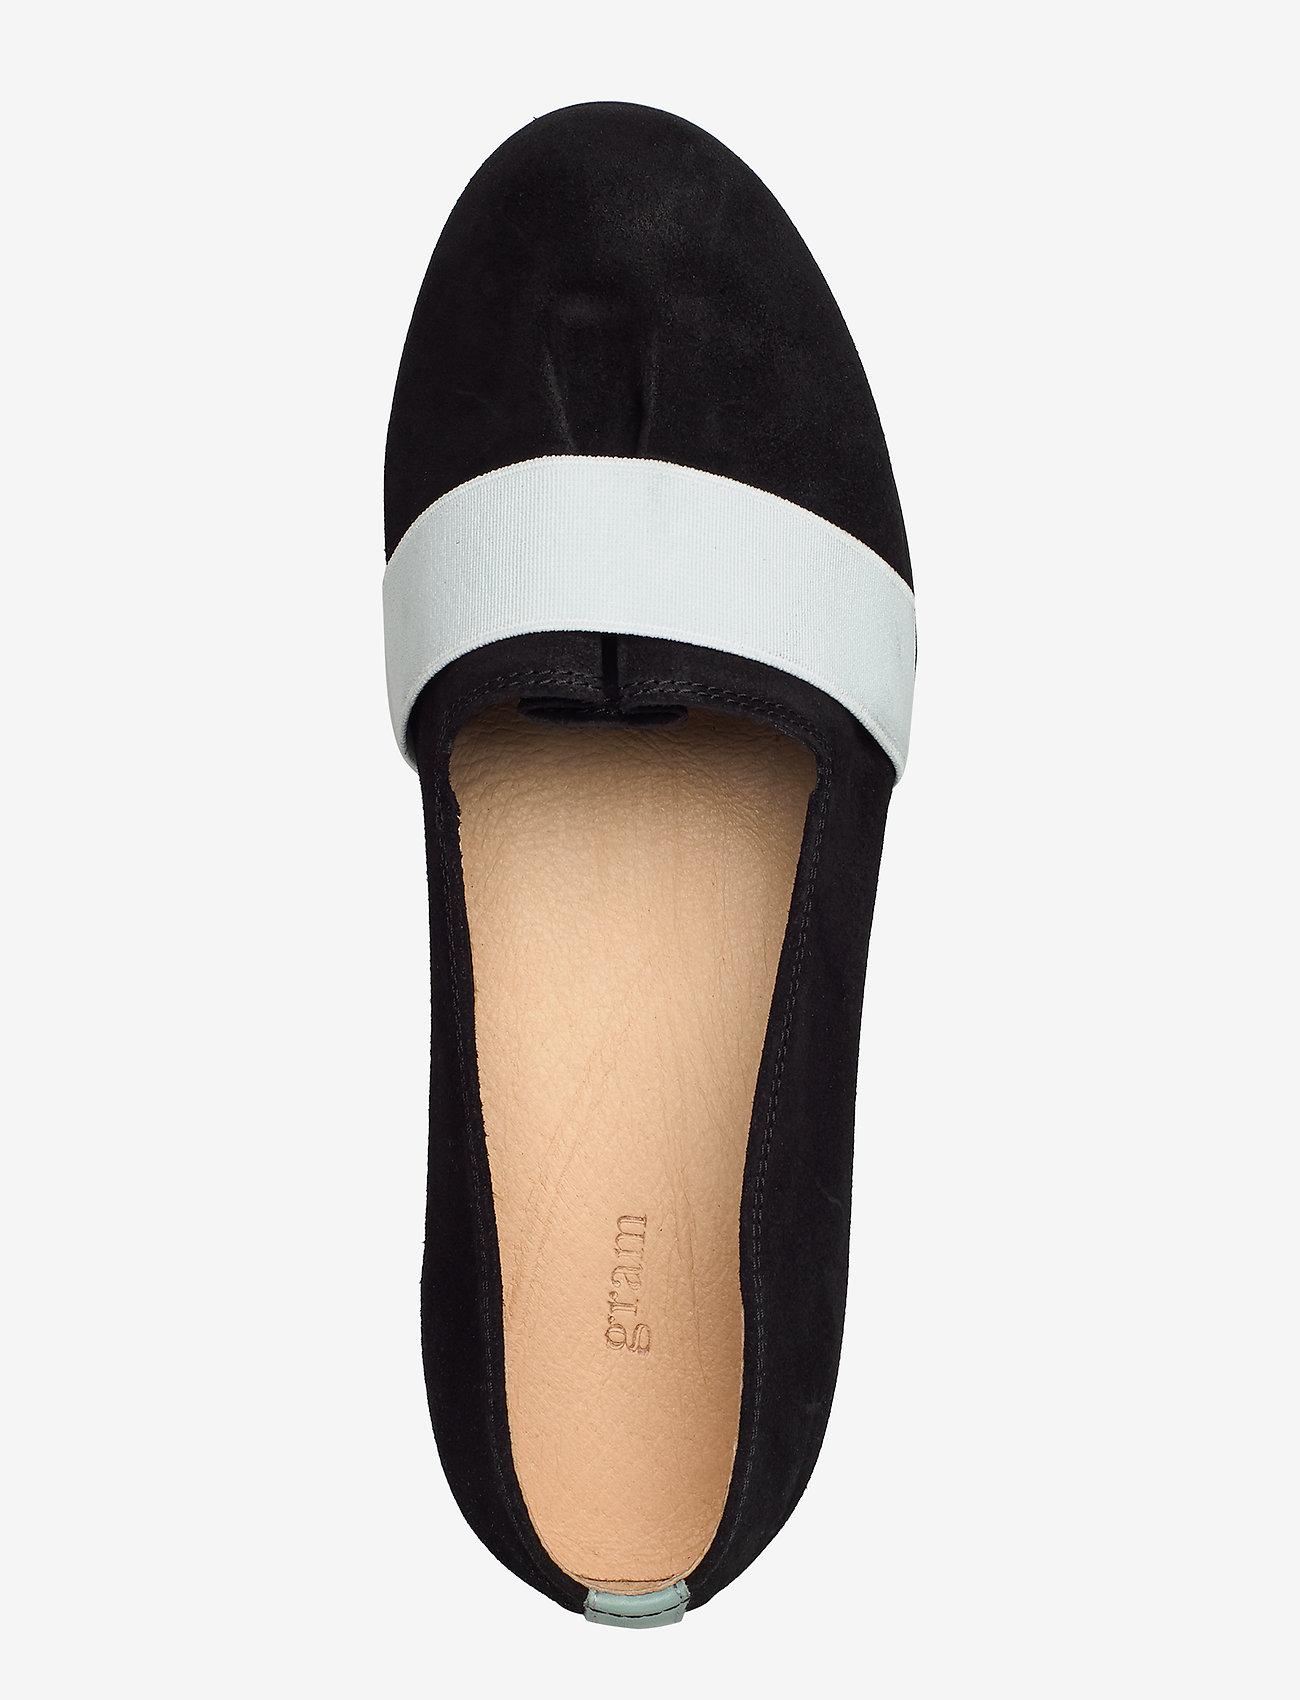 Yatfai Ballerina Black Suede (Black) - Gram